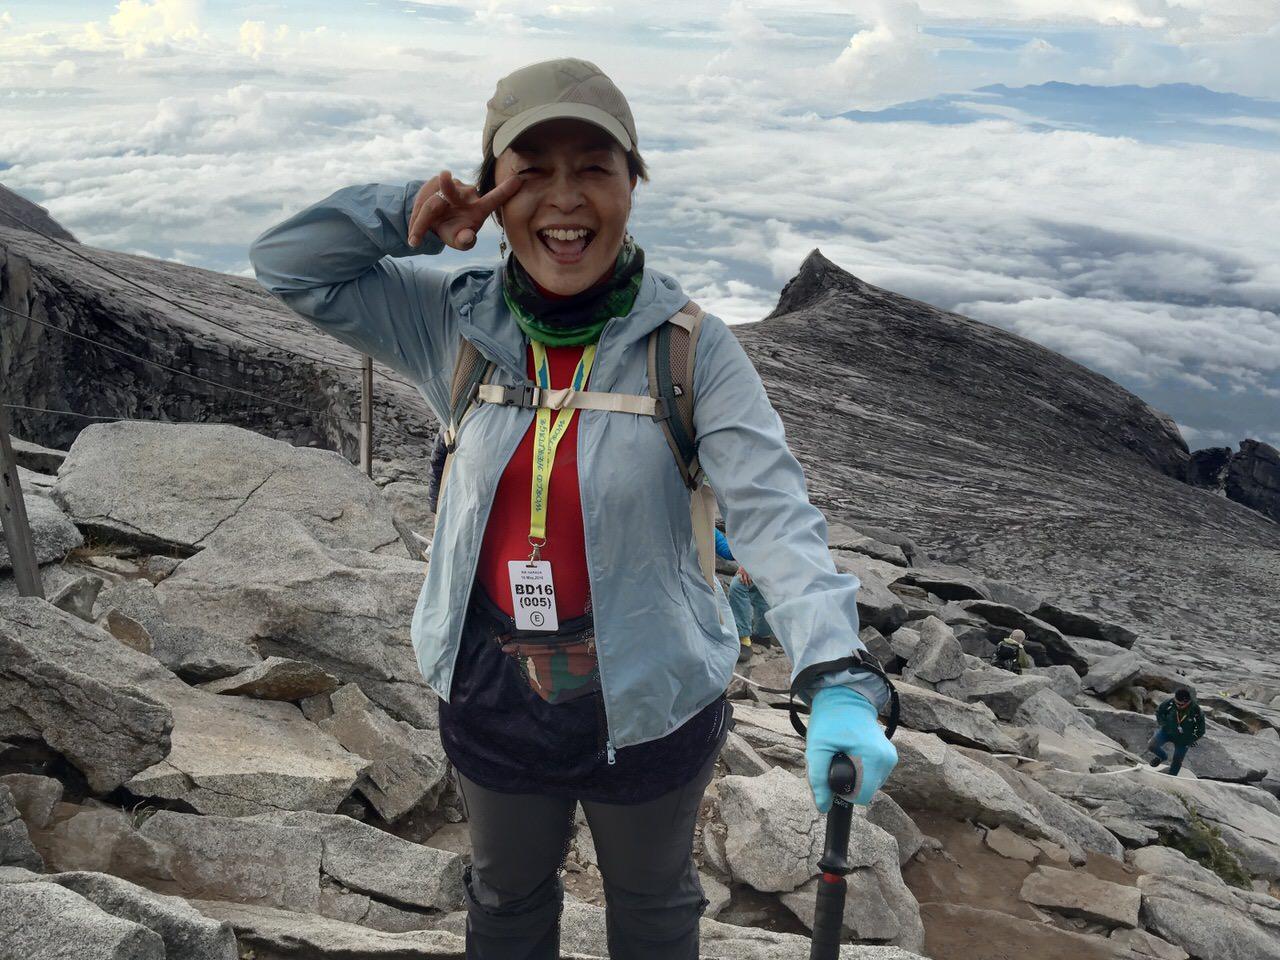 Kota Kinabalu climbing 4162